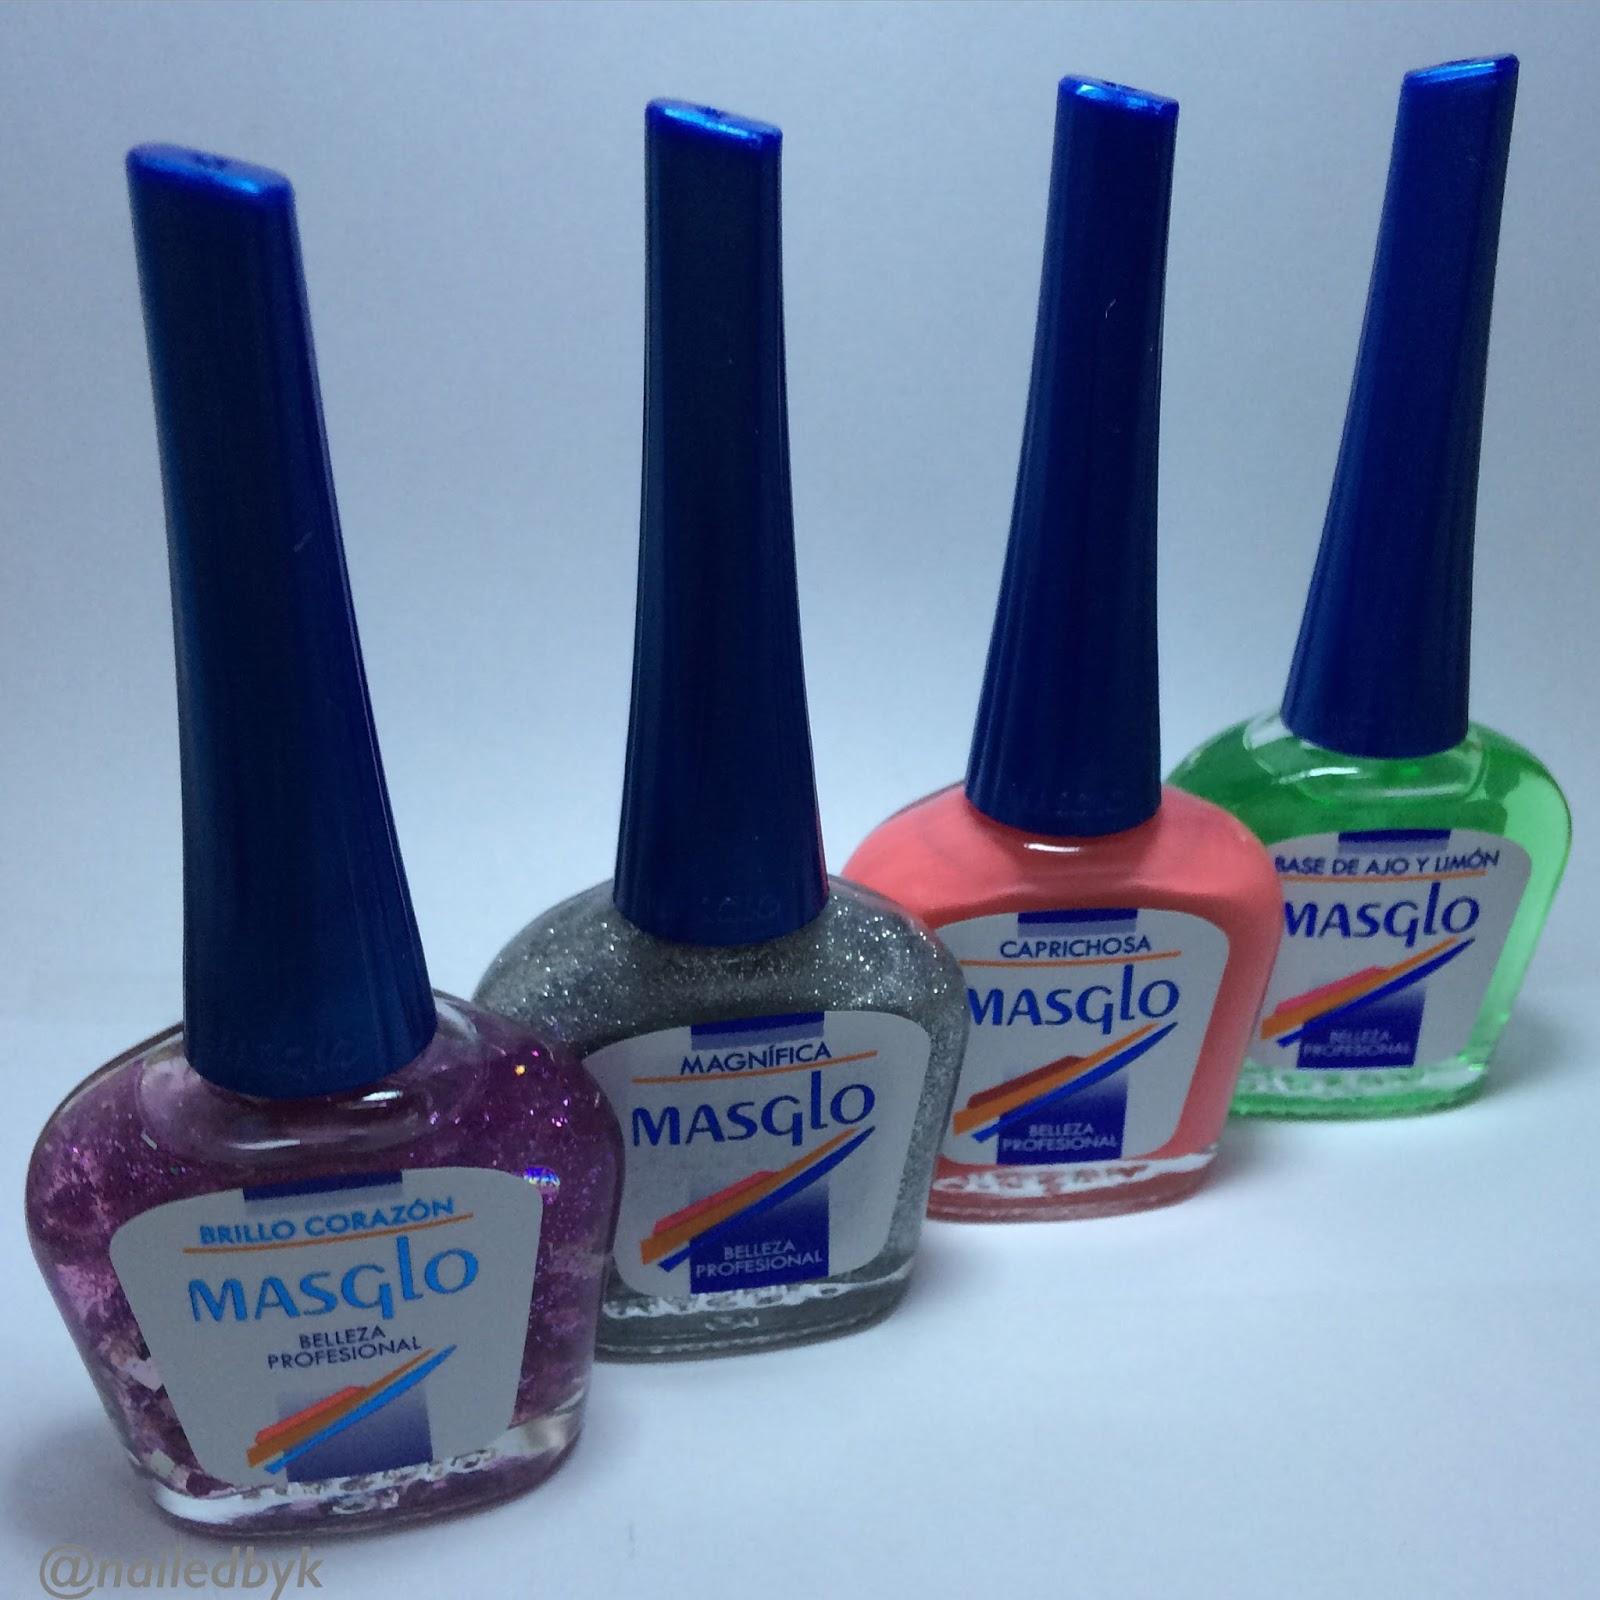 Masglo Nail Polish - Swatch and Review | Nailed by Kim